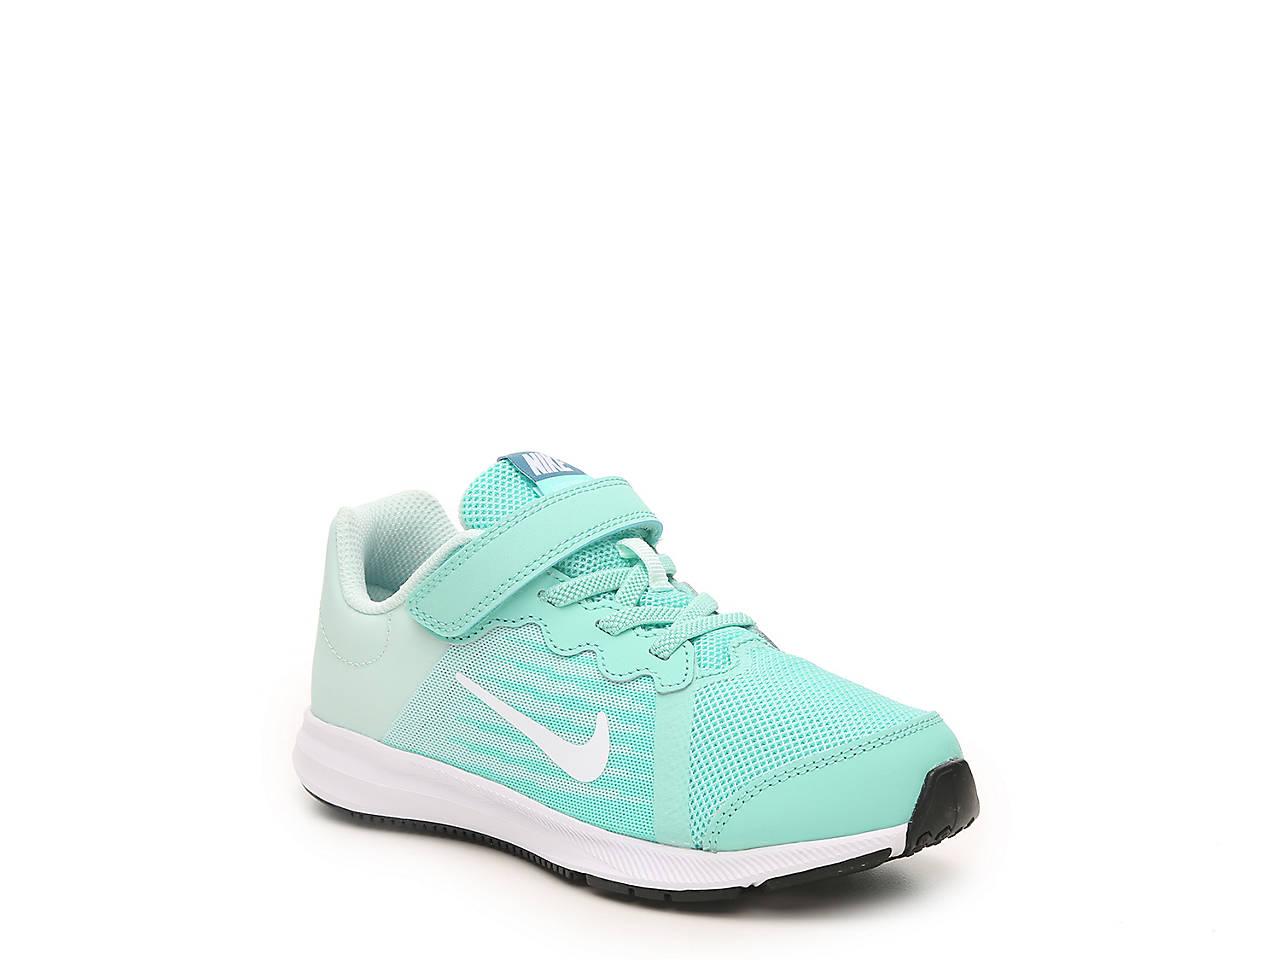 e3eb02180 Nike Downshifter 8 Toddler & Youth Running Shoe Kids Shoes | DSW